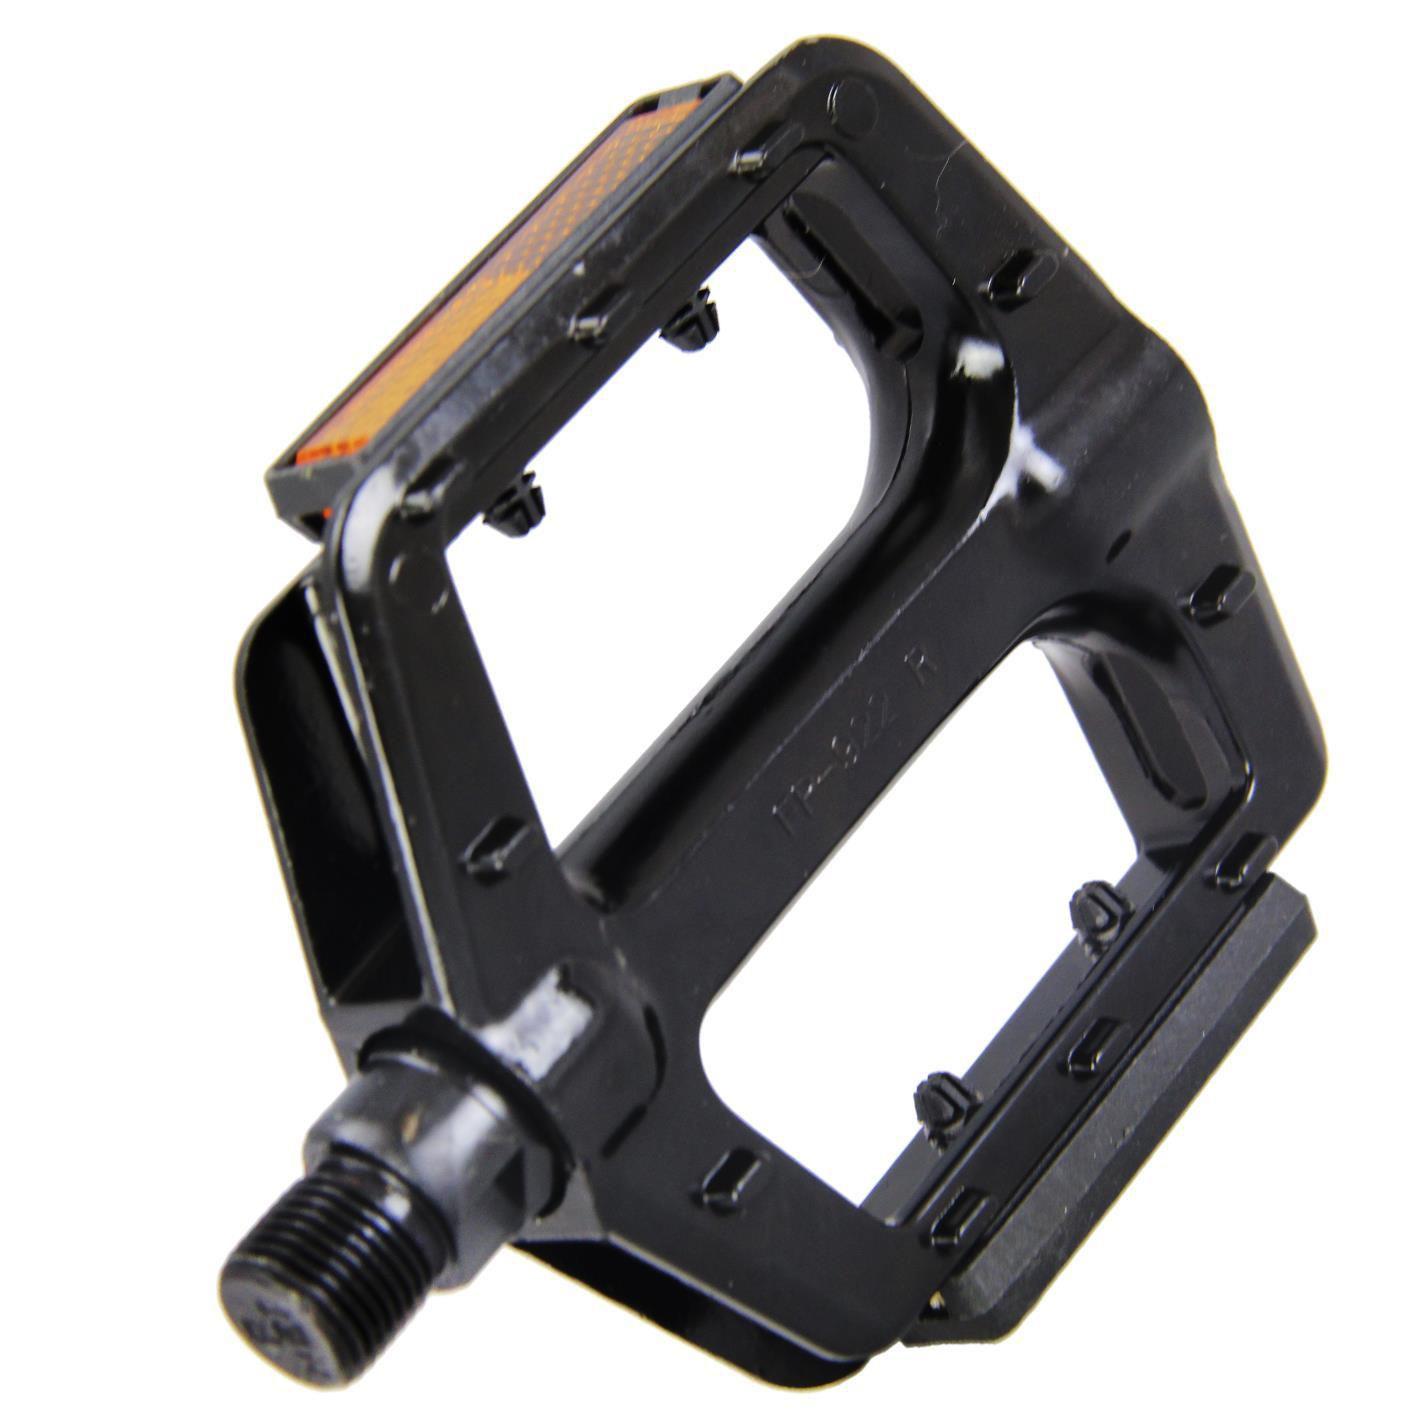 Pedal Free Style - FP-922 - Alumínio Preto